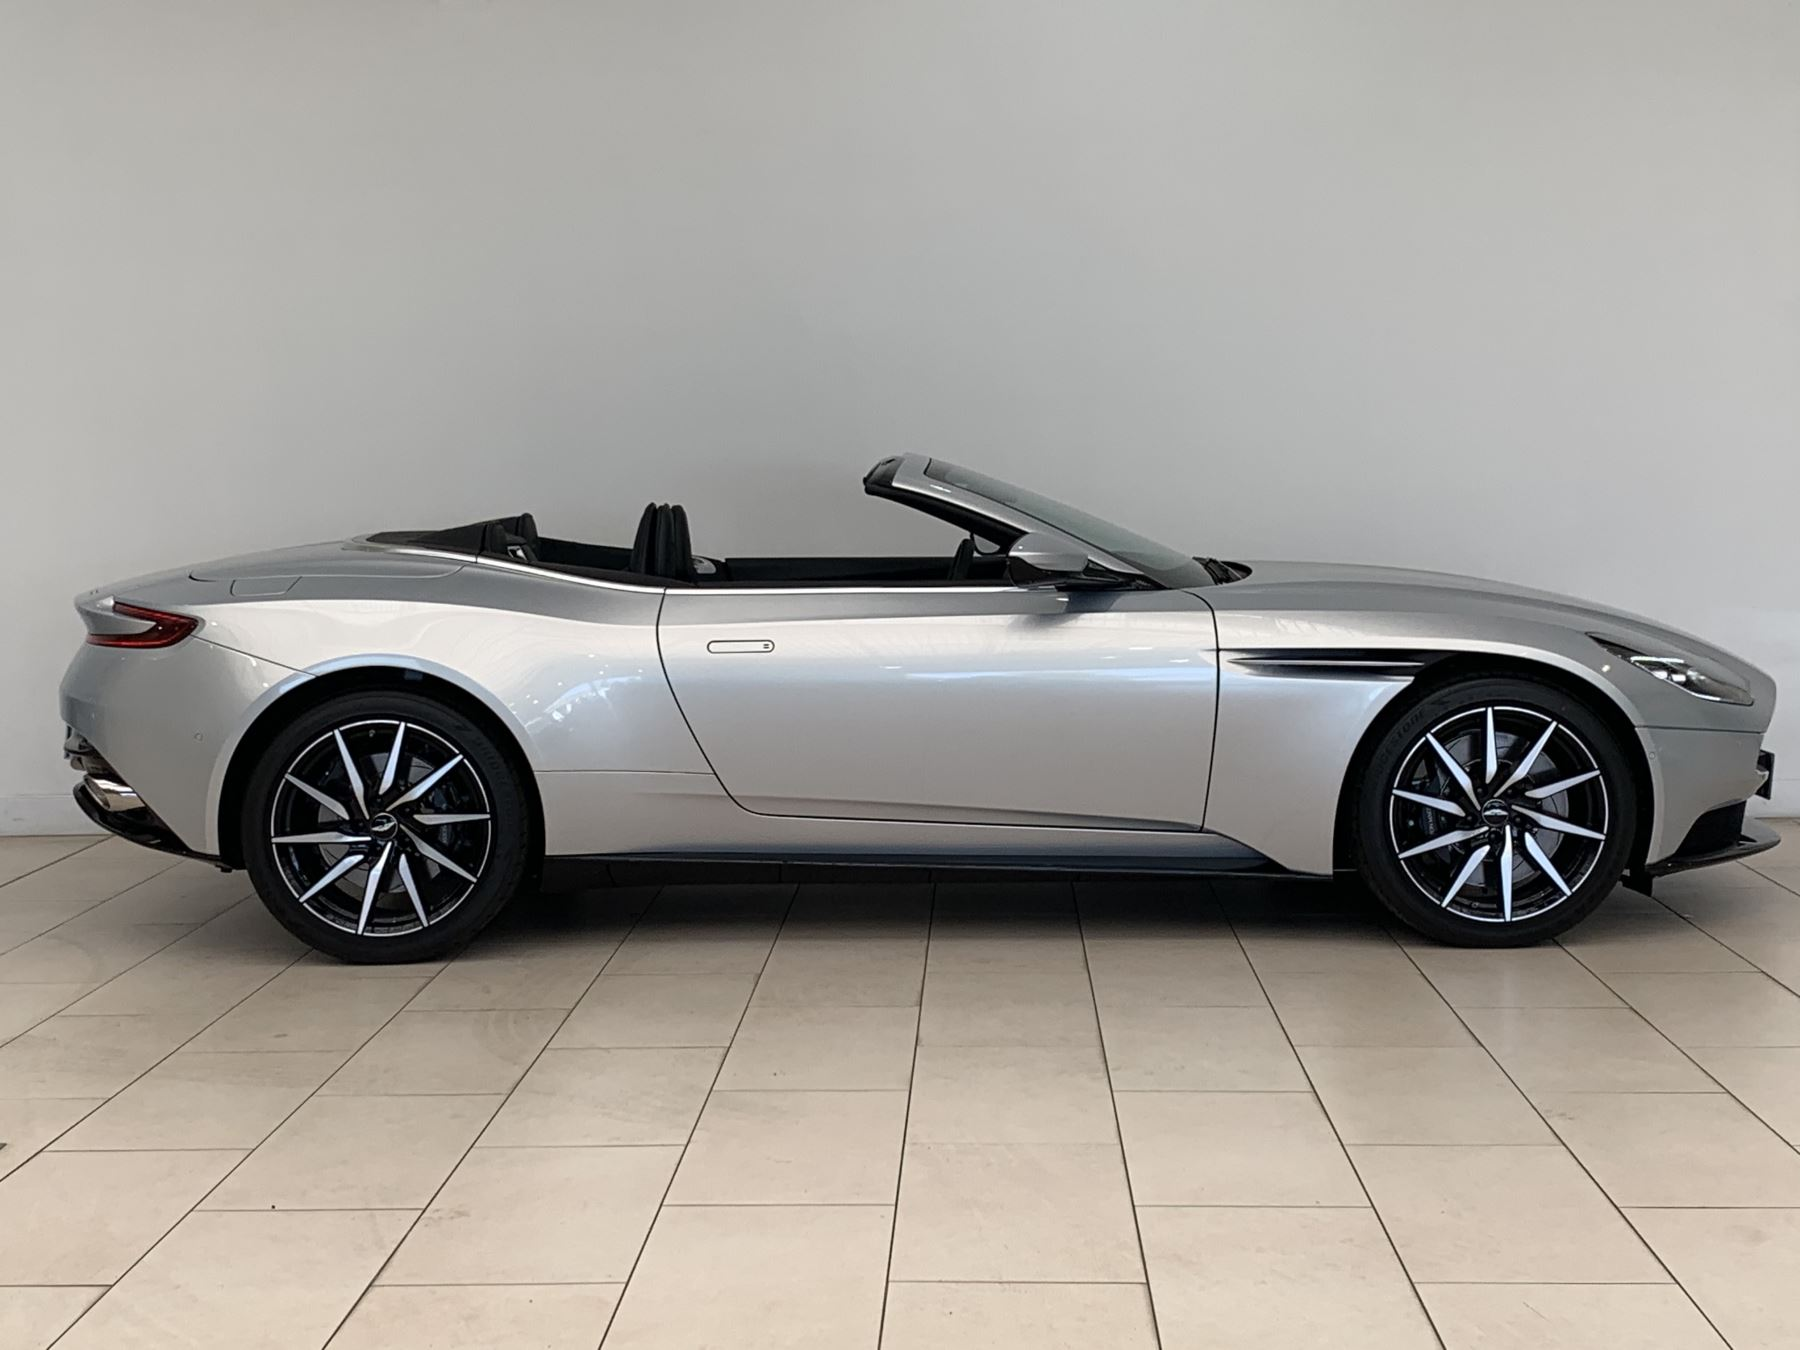 Aston Martin DB11 V8 Volante 2dr Touchtronic image 3